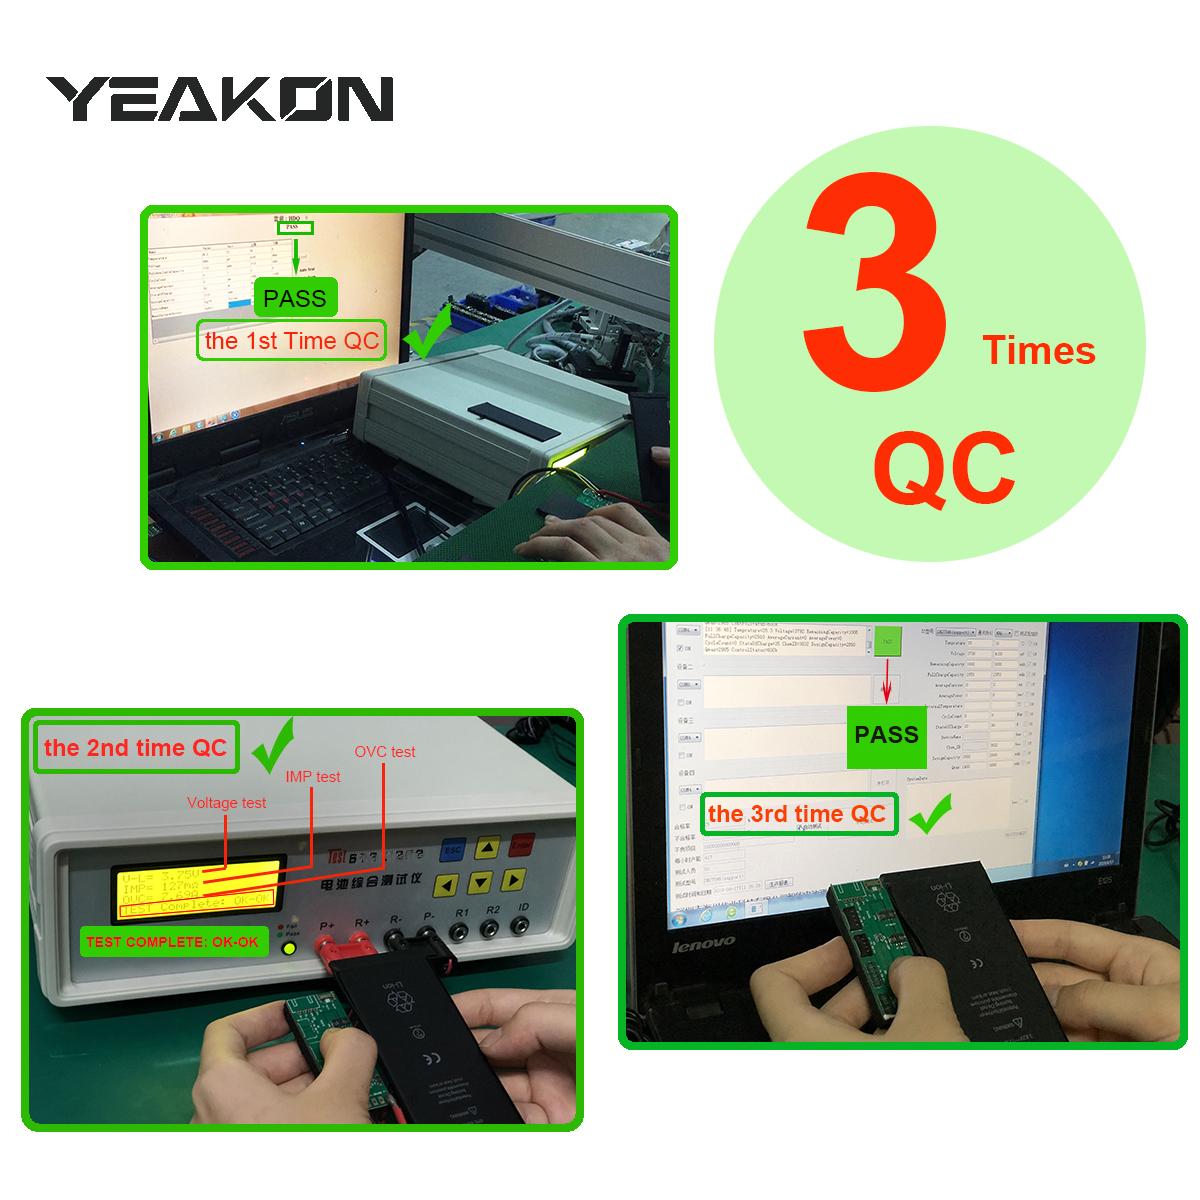 Yeakon чехлы для айфонов 5 5G запасная аккумуляторная батарея для iPhone 5 5S 5C SE, 6, 6S, 6P 6SP 7 7G 7P 8 8G 8P Plus X XS MAX XR 11 12 13 Pro MAX батареи